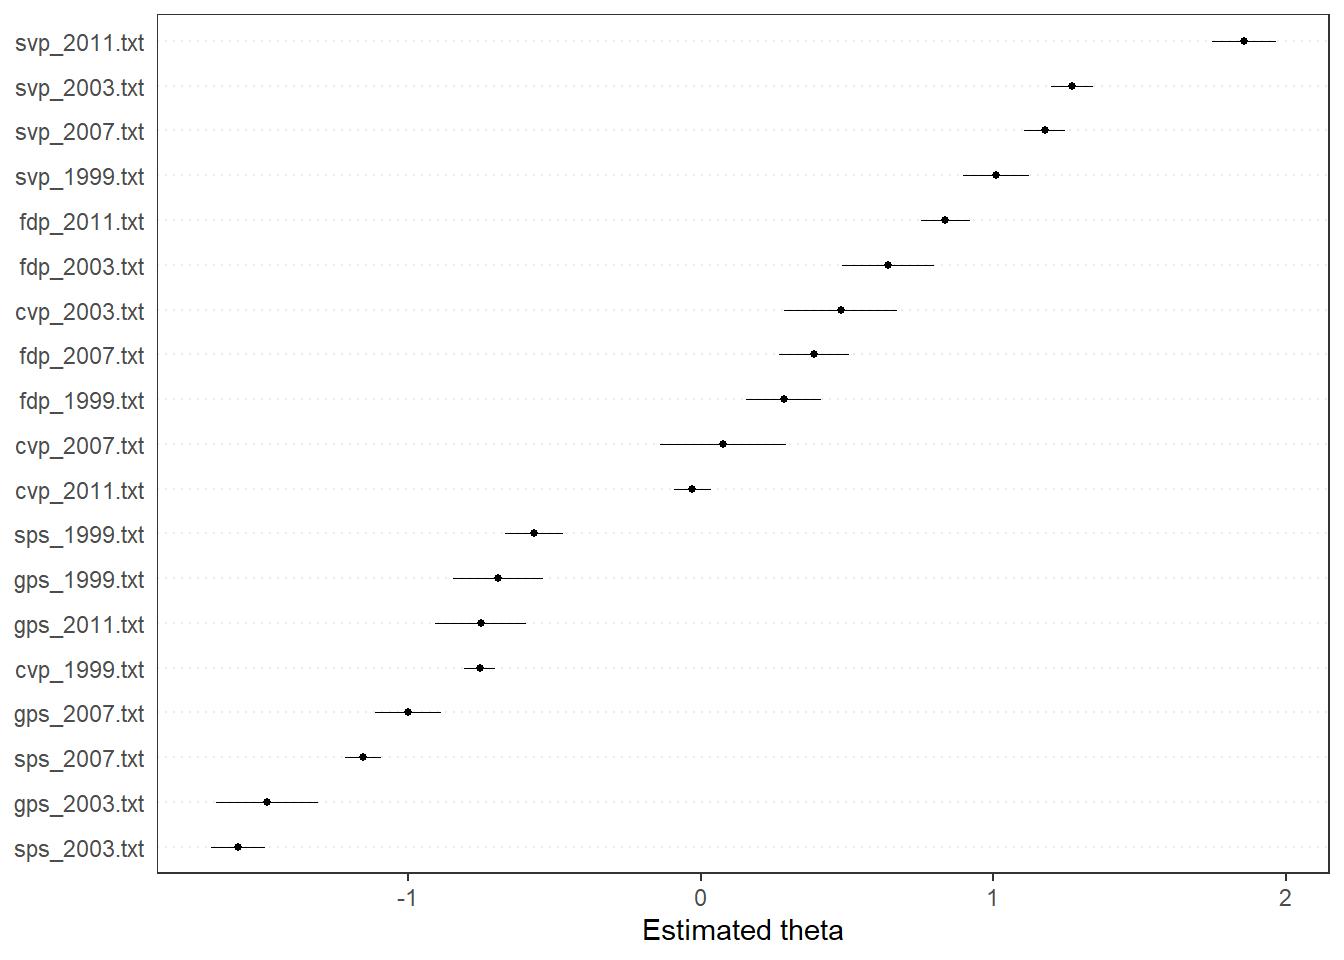 Quantitative Analysis of Political Text